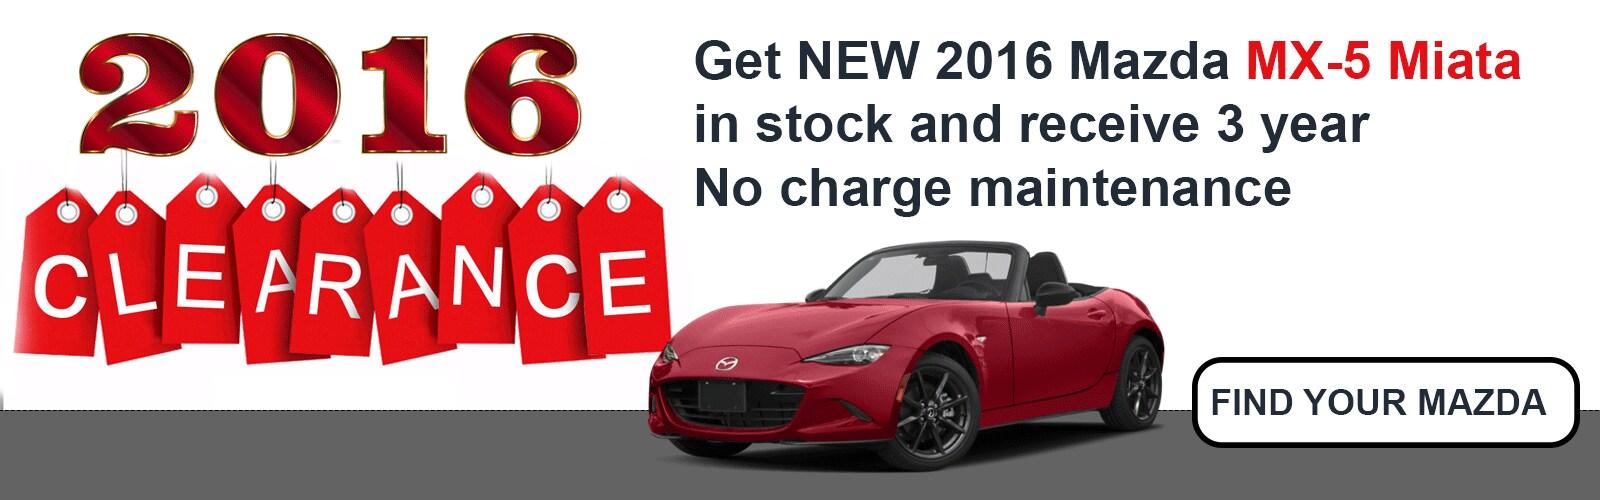 Ourisman Mazda New Mazda Dealership In Laurel MD - Mazda dealers maryland